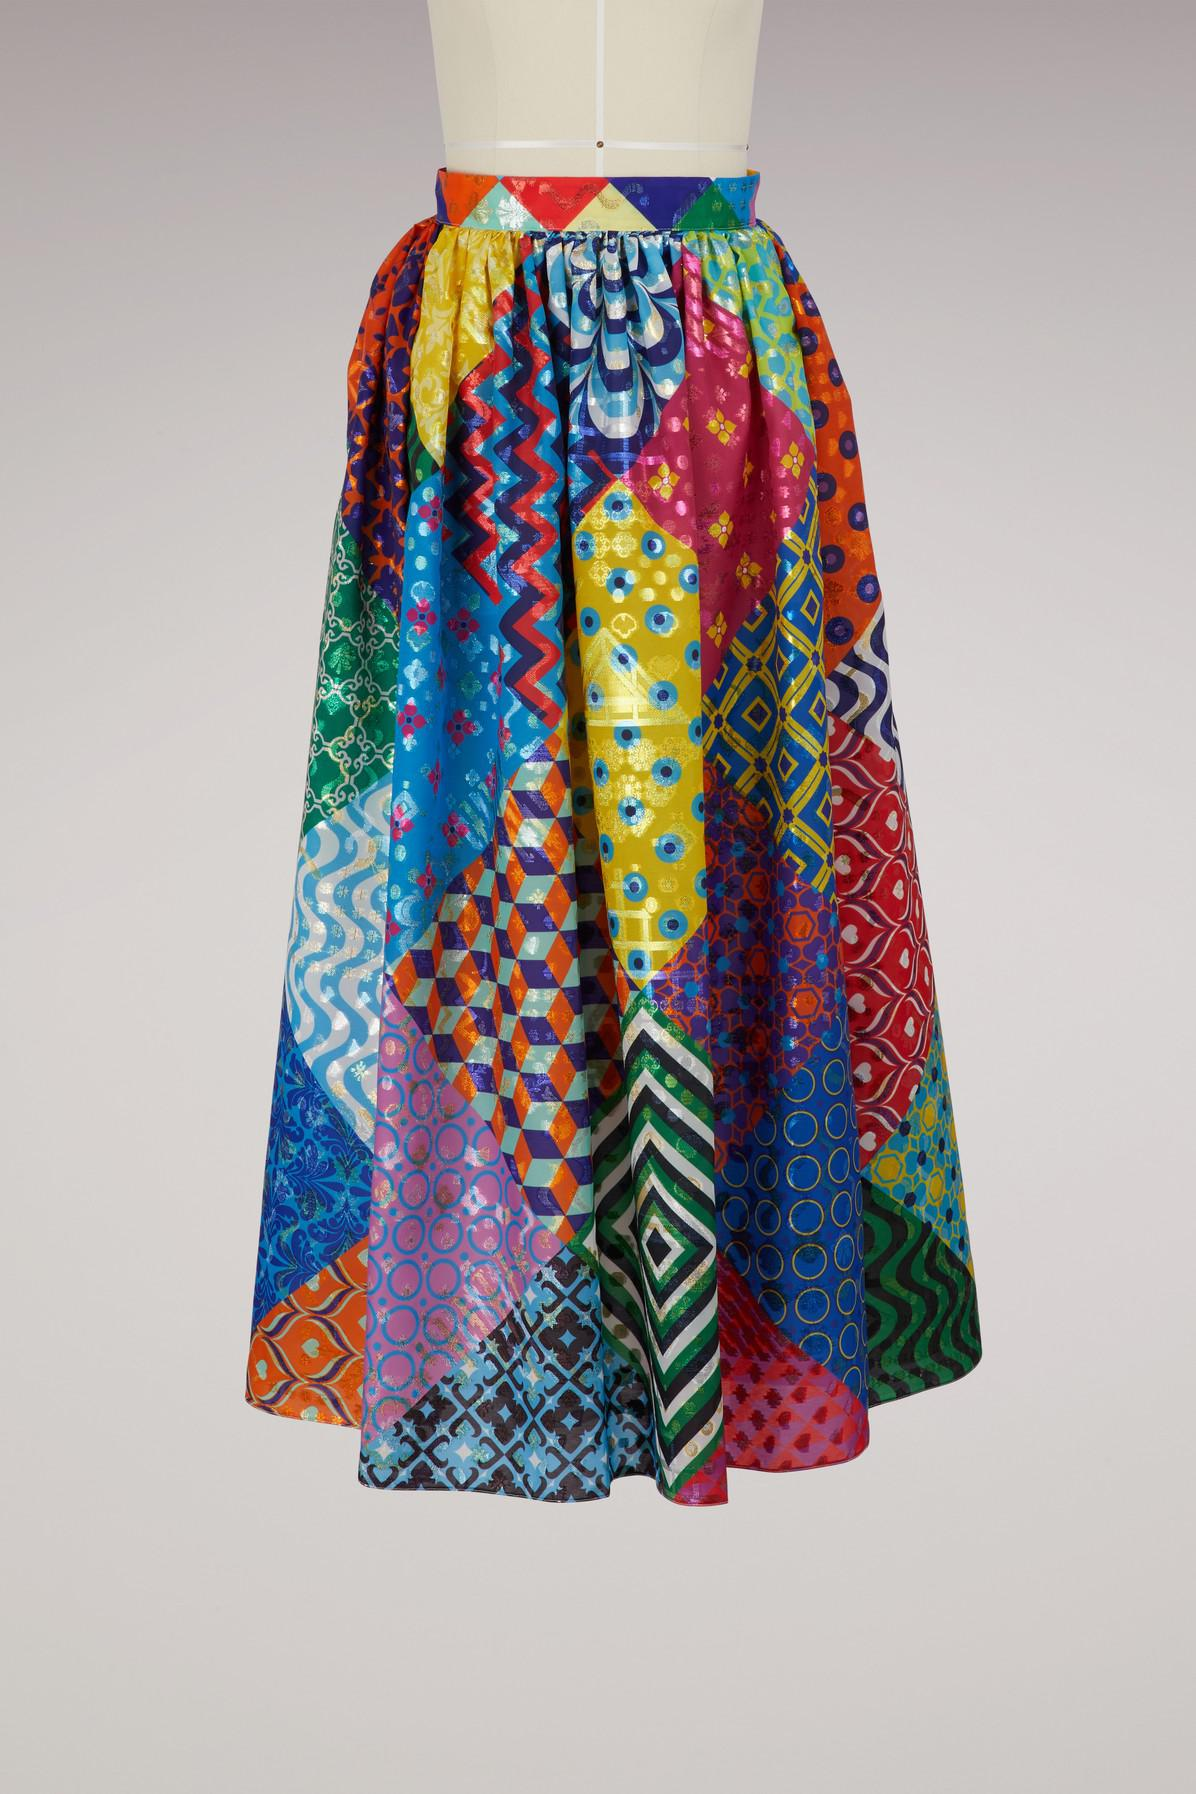 910f86a083 Lyst - Mary Katrantzou Egret Printed Skirt in Blue